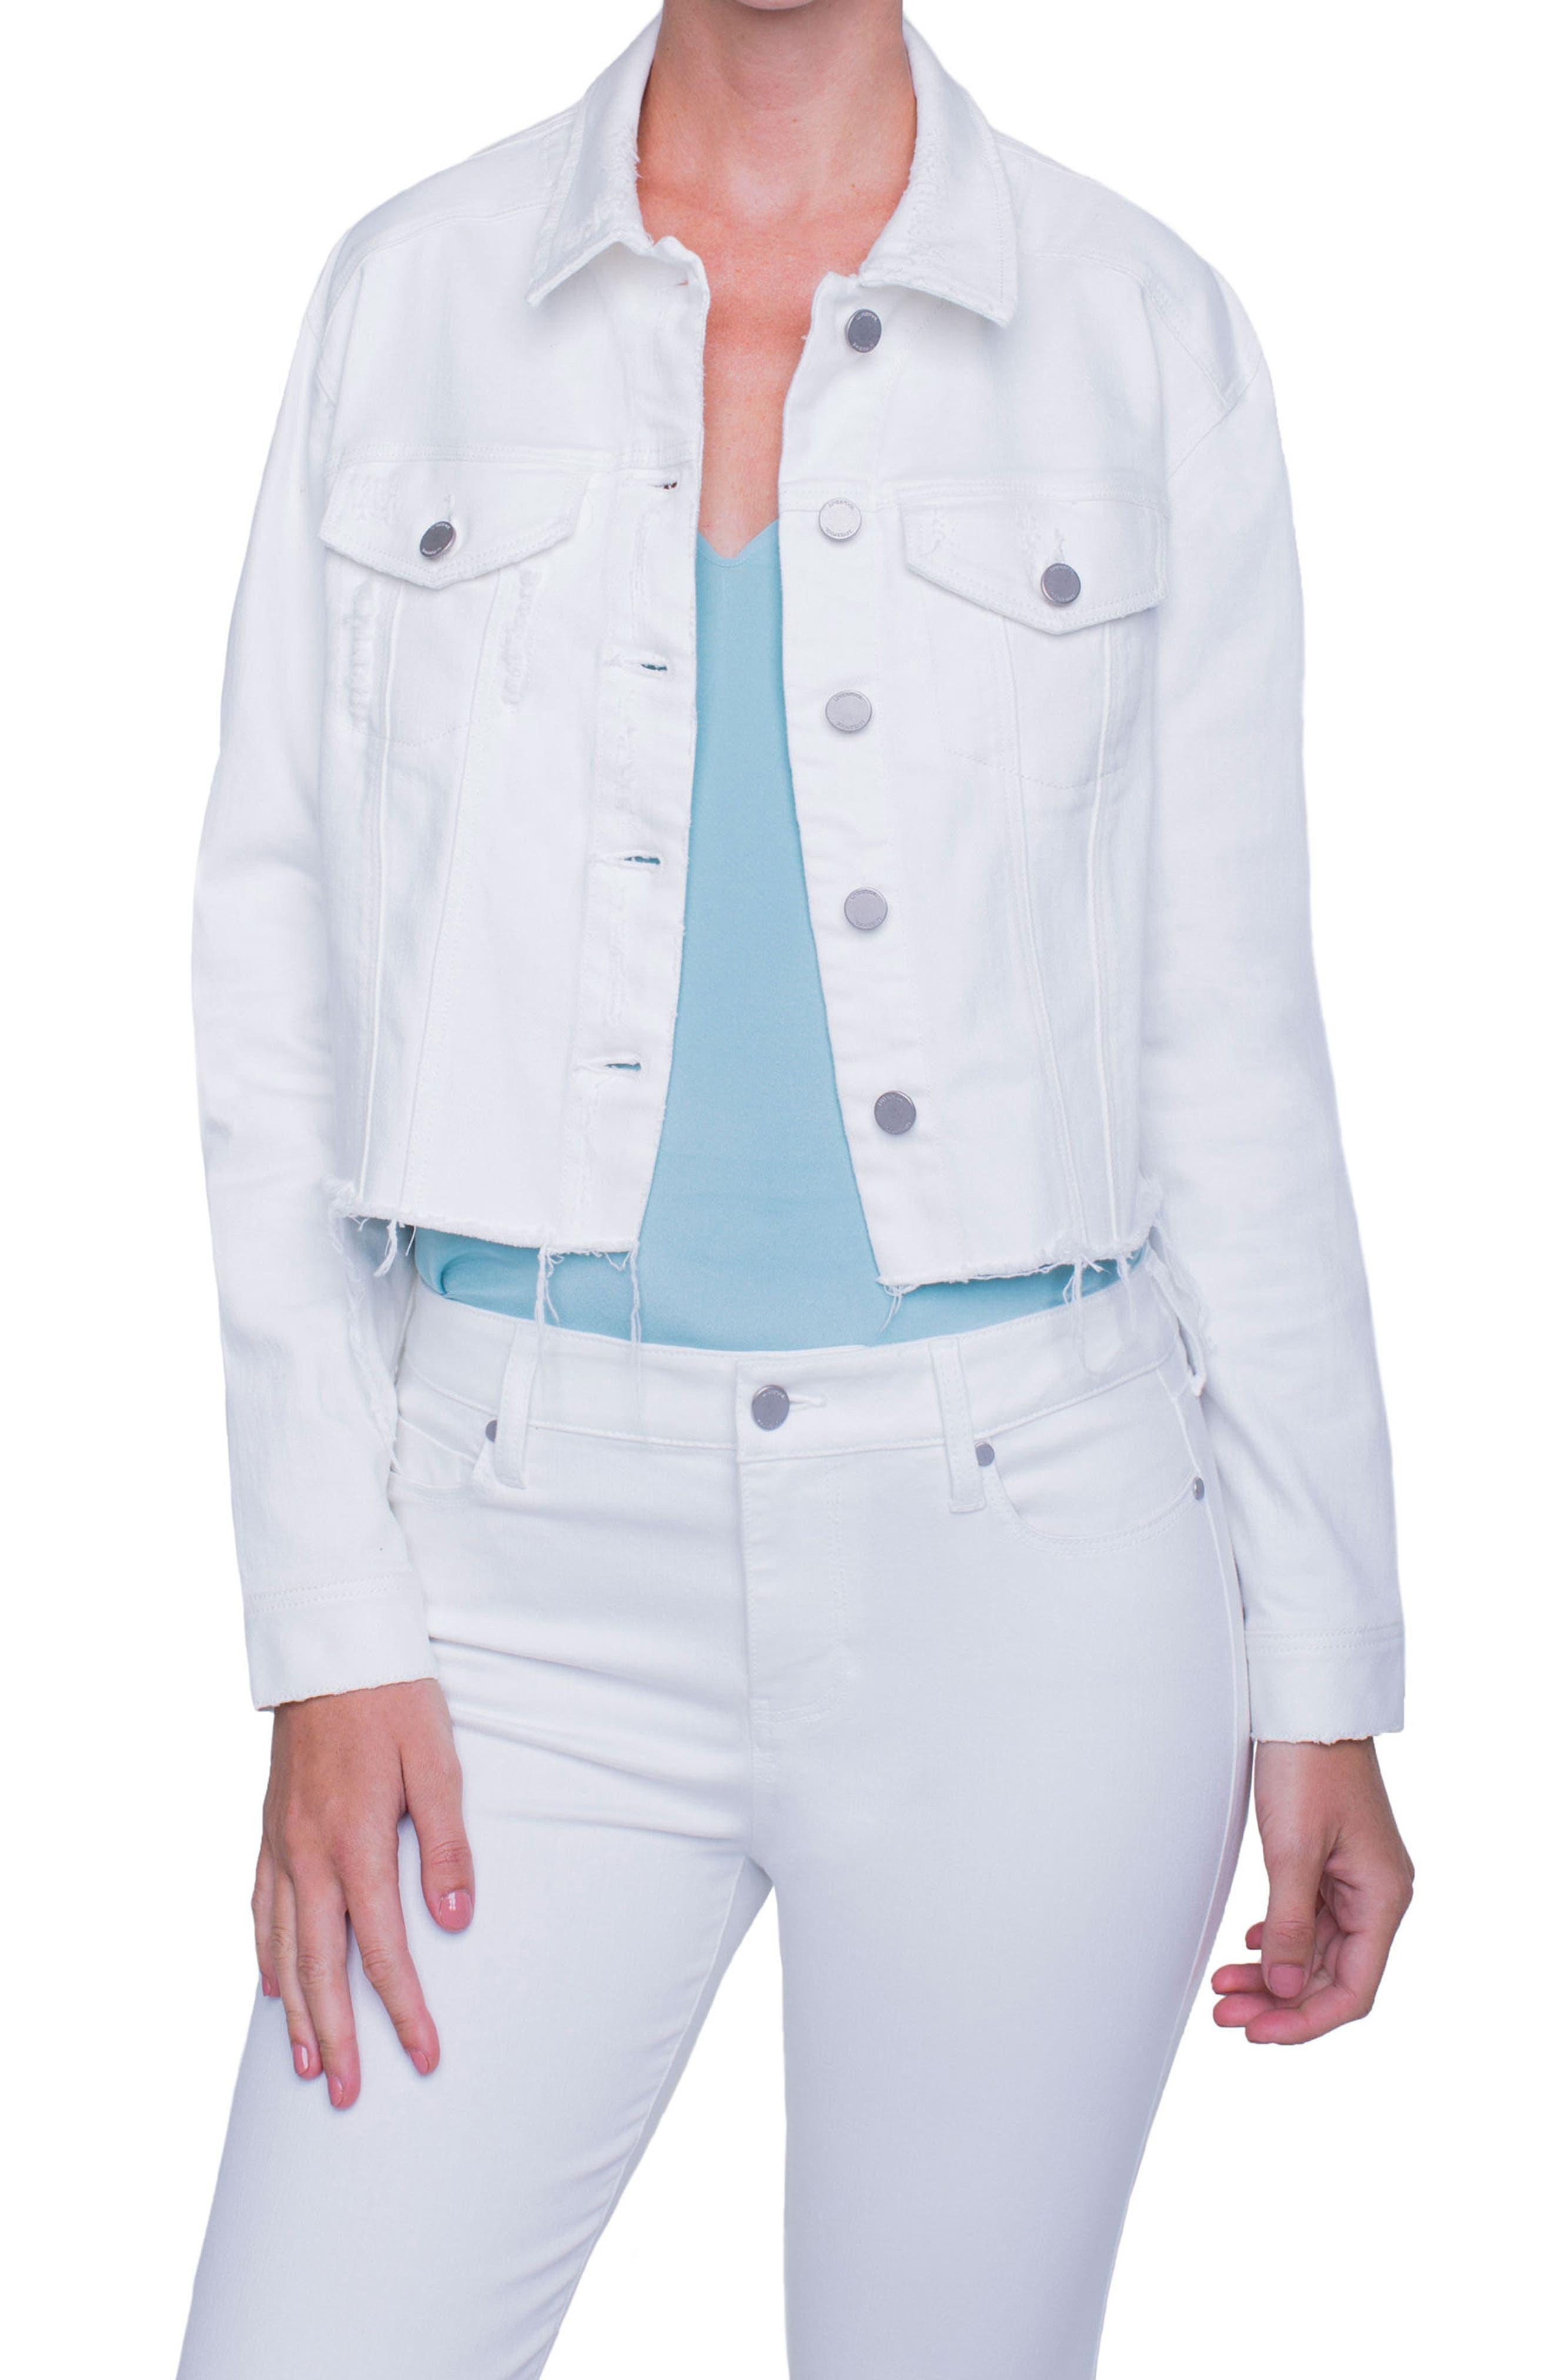 Main Image - Liverpool Jeans Company Raw Edge Denim Jacket (Magnolia Destruct)